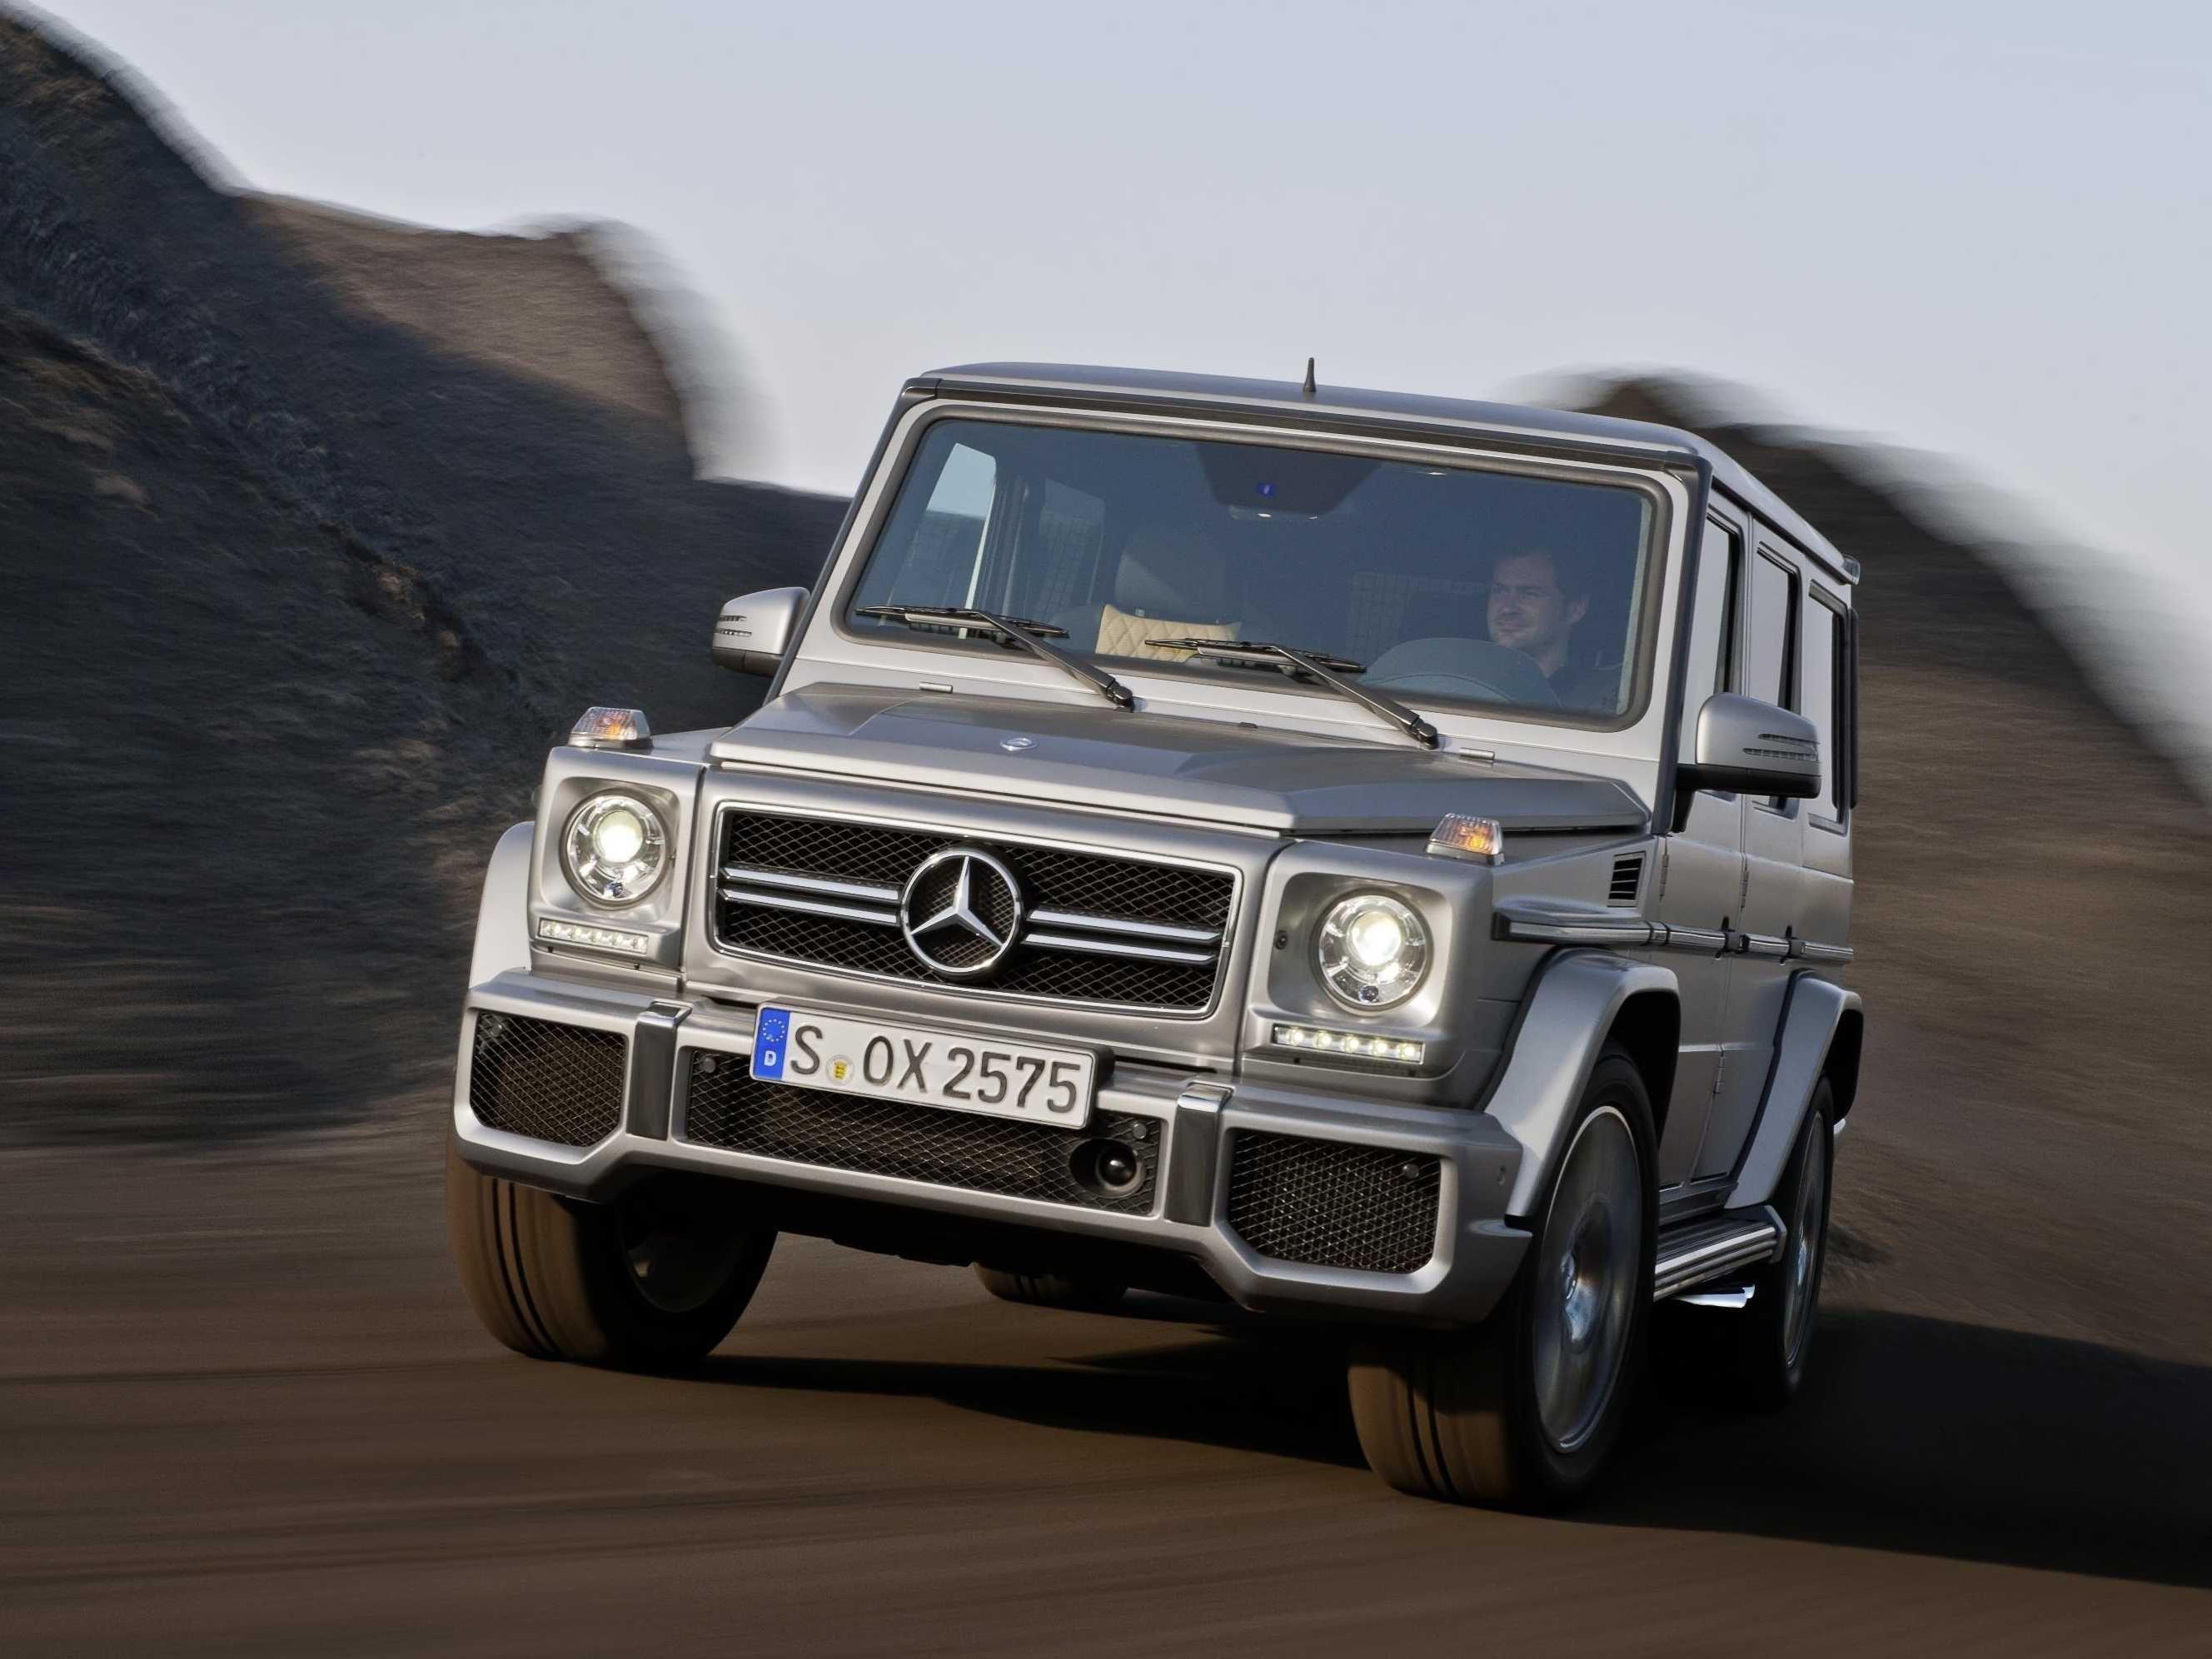 Mercedes Benz G Class 6x6 Price In India